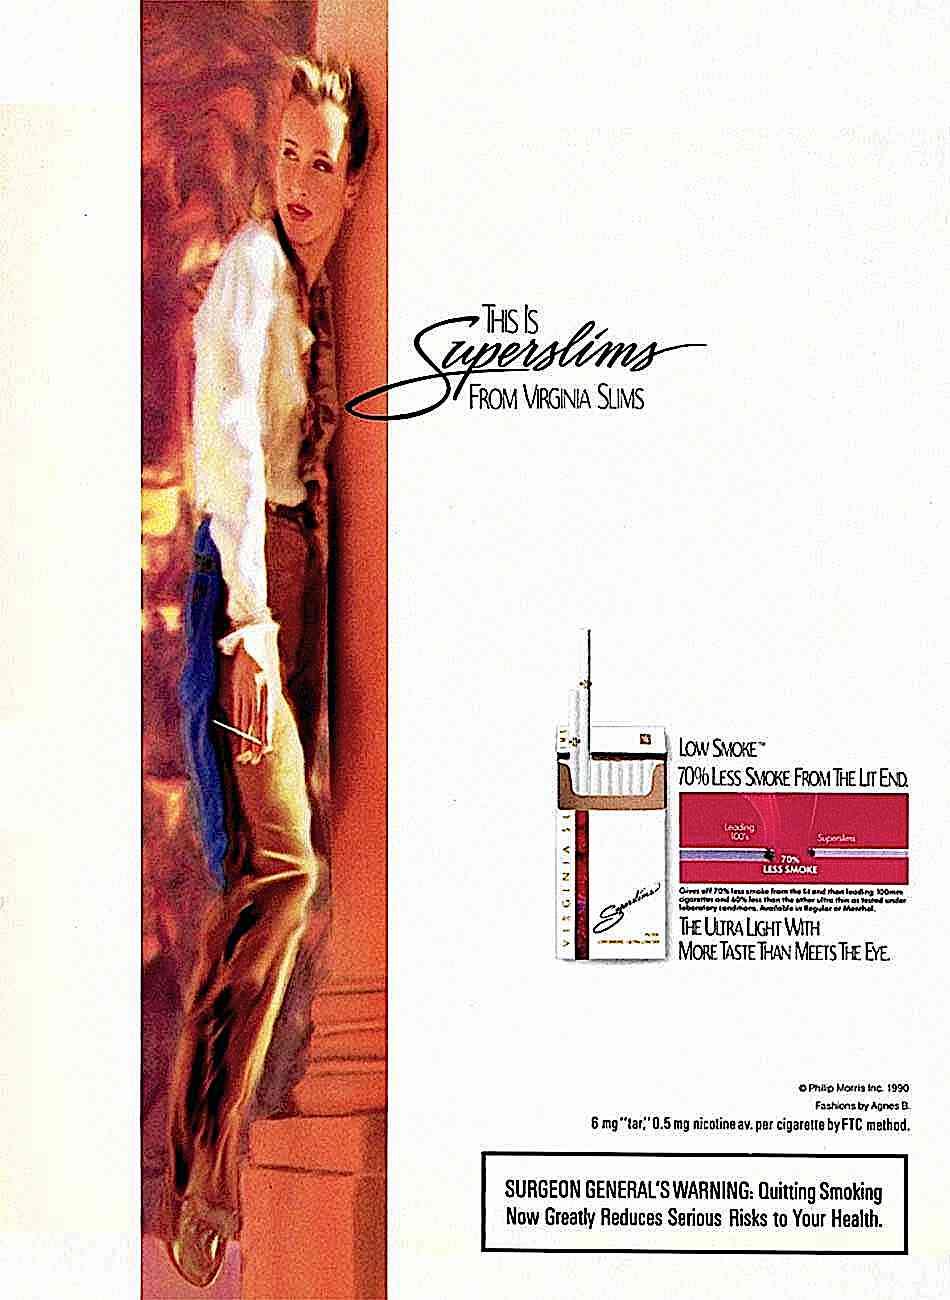 1972 Virginia Superslims advertisement